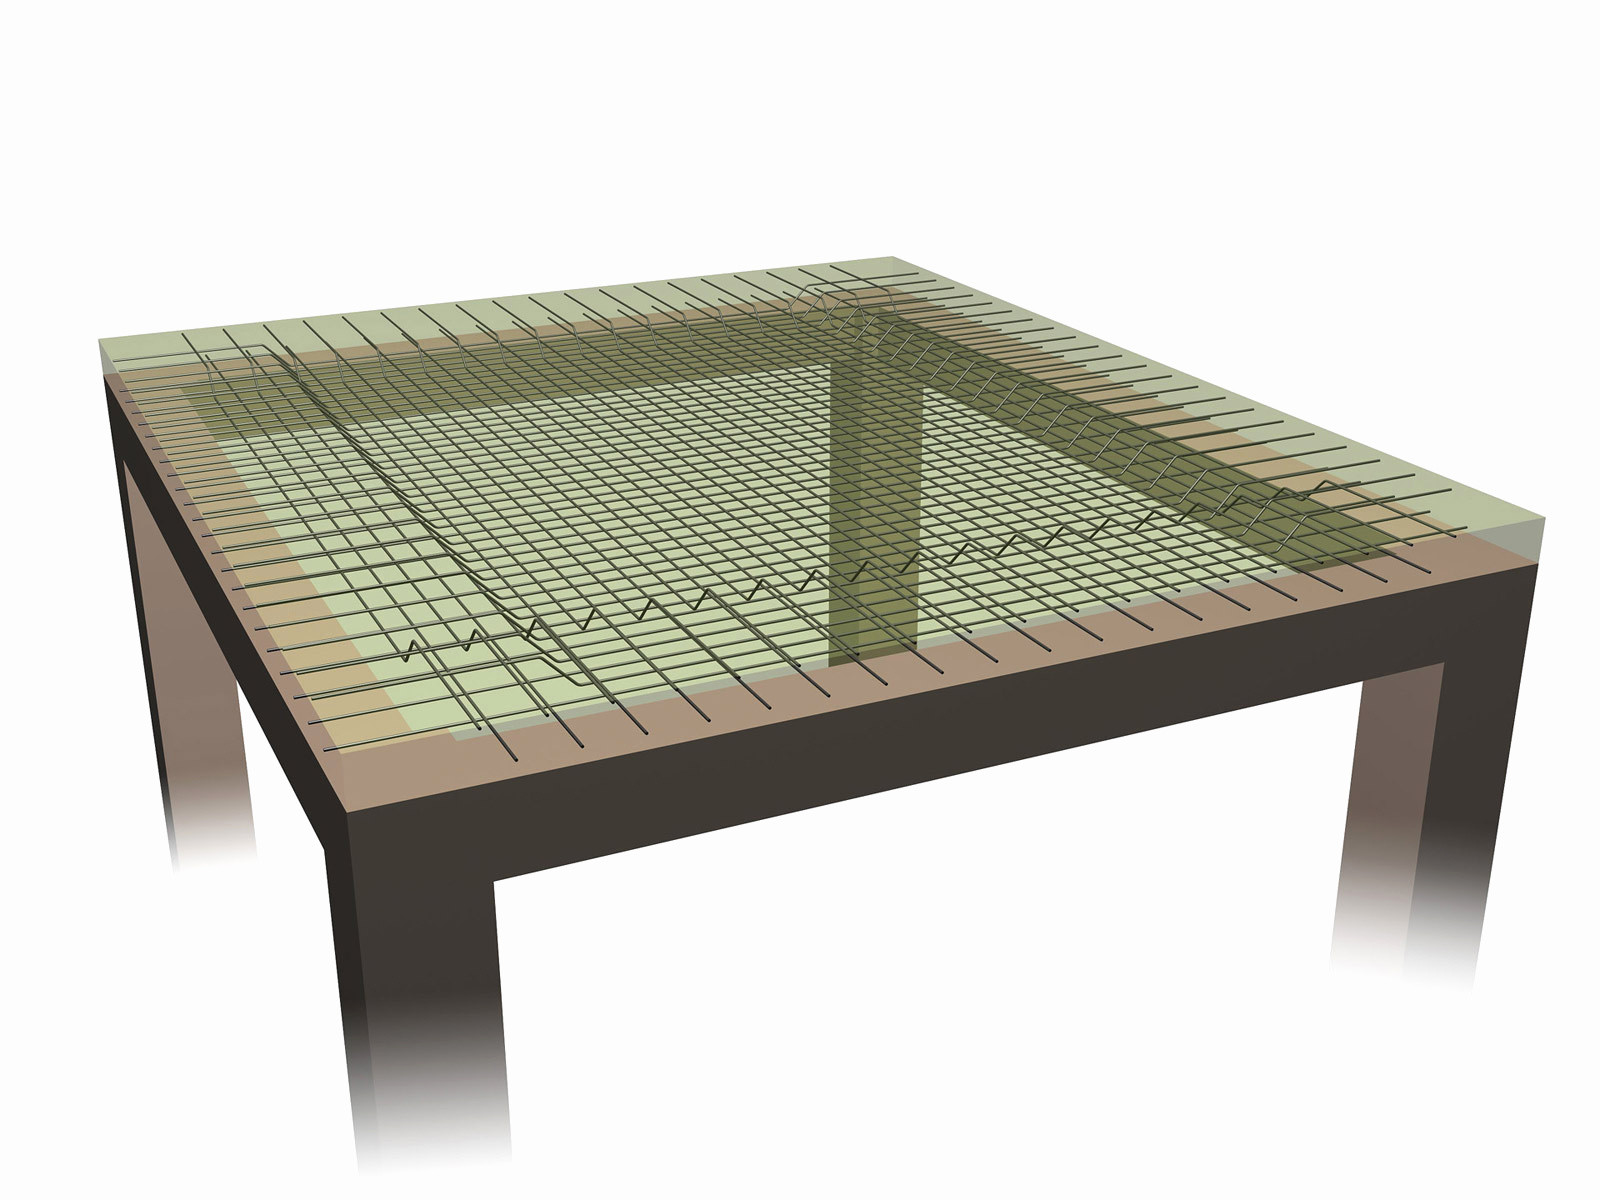 Hardwood Floors On Slab Of Concrete Floor Slab Luxury How to Stain Concrete Floors Wlcu Regarding Concrete Floor Slab Luxury Two Way Slab Concrete Floor